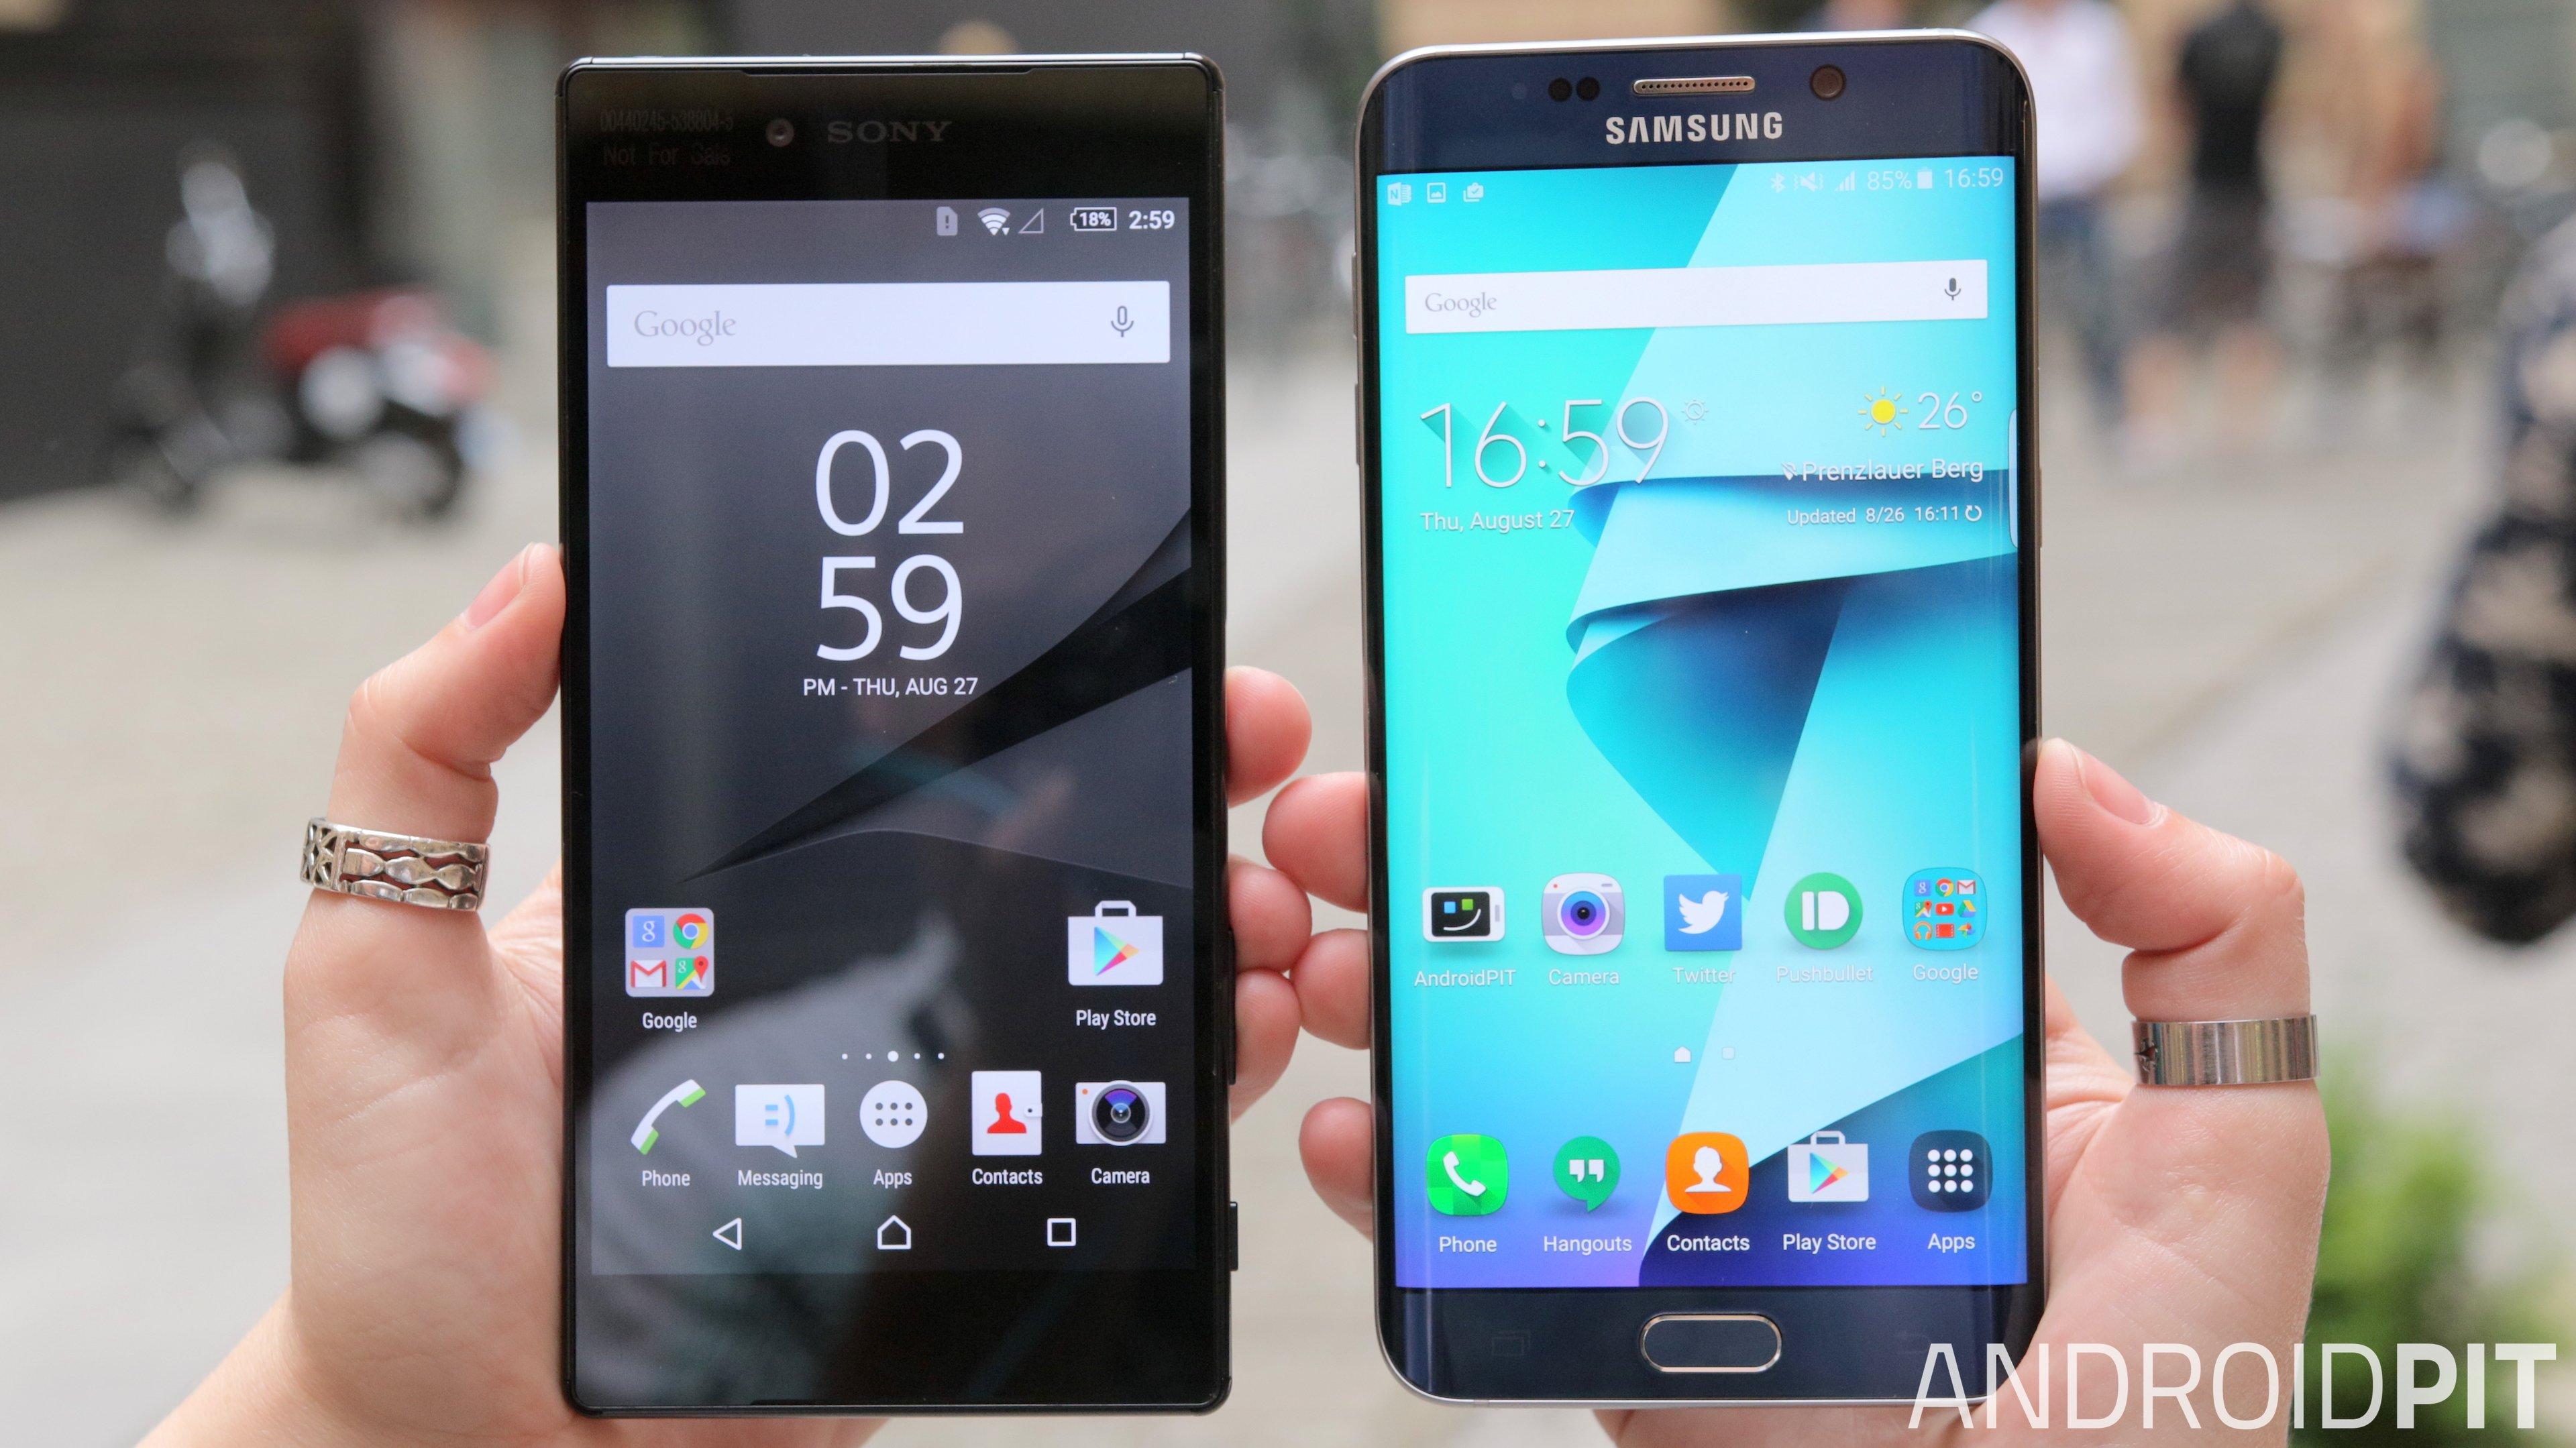 Sony Xperia Z5 Premium Vs Samsung Galaxy S6 Edge Vergleich Der